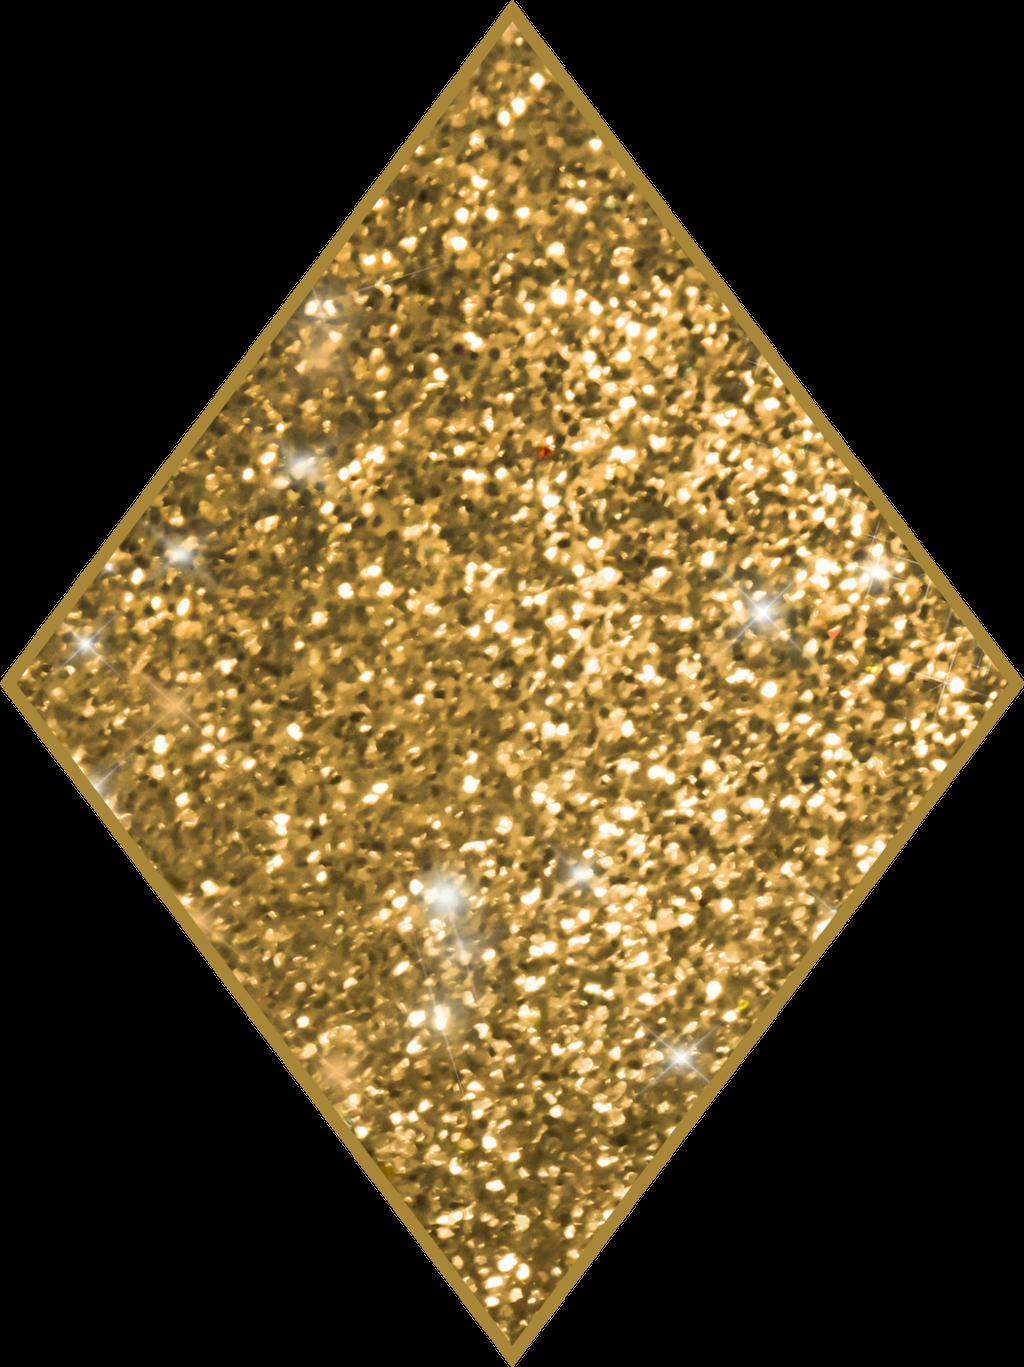 Diamond shape sticker by. Diamonds clipart gold glitter